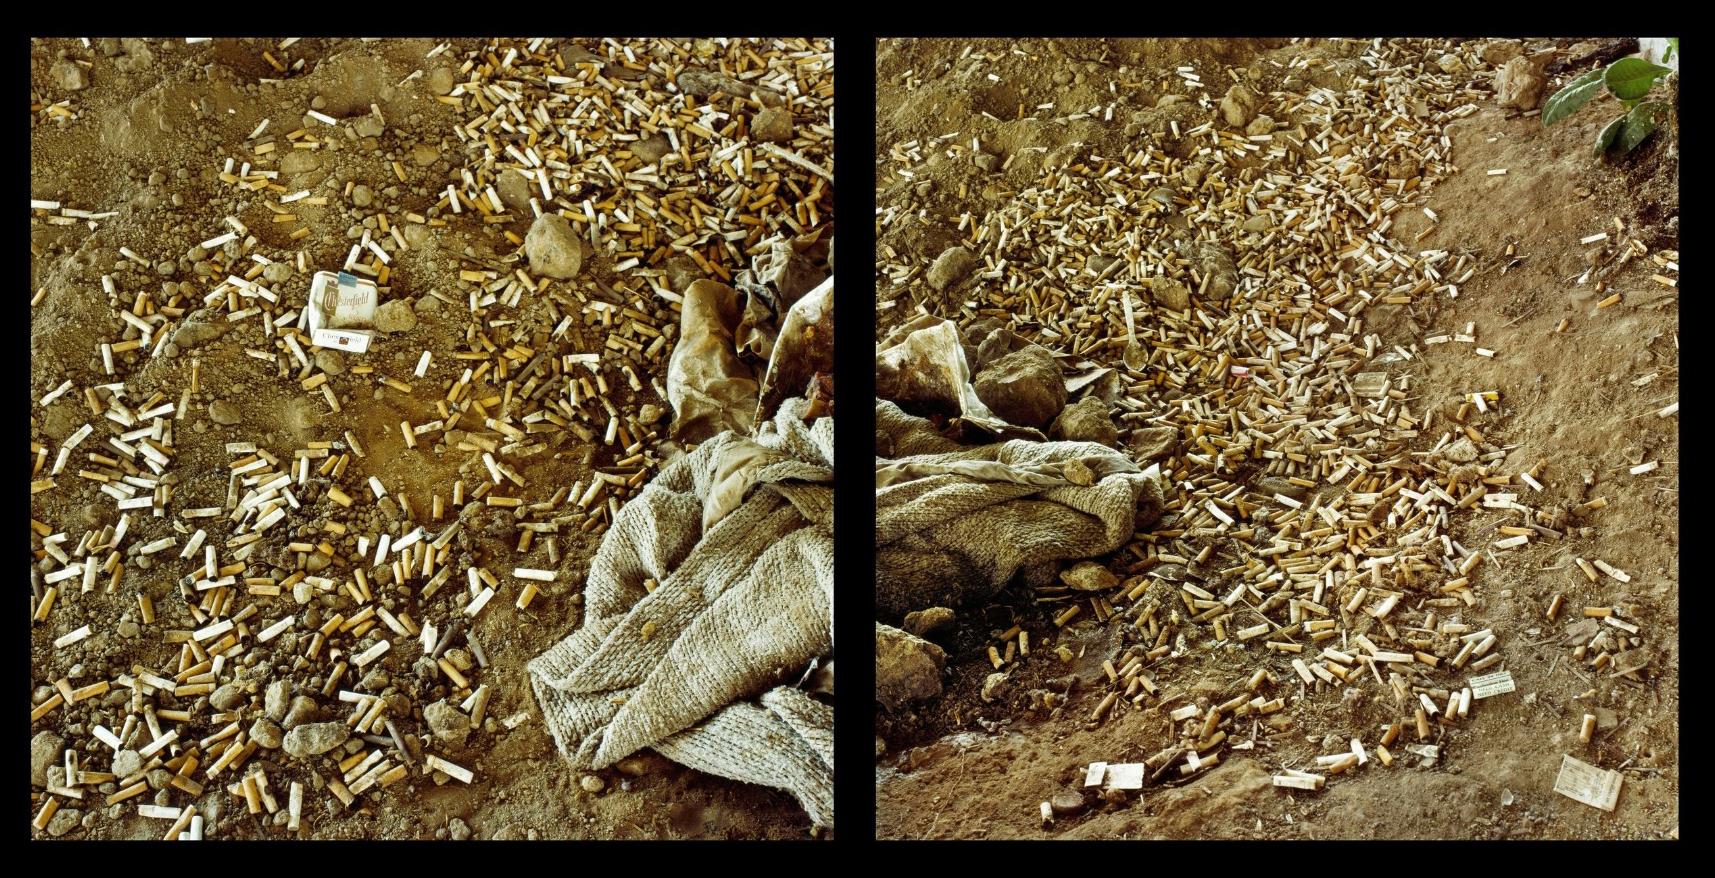 Anthony Hernandez, Landscapes for the Homeless #24 , 1990